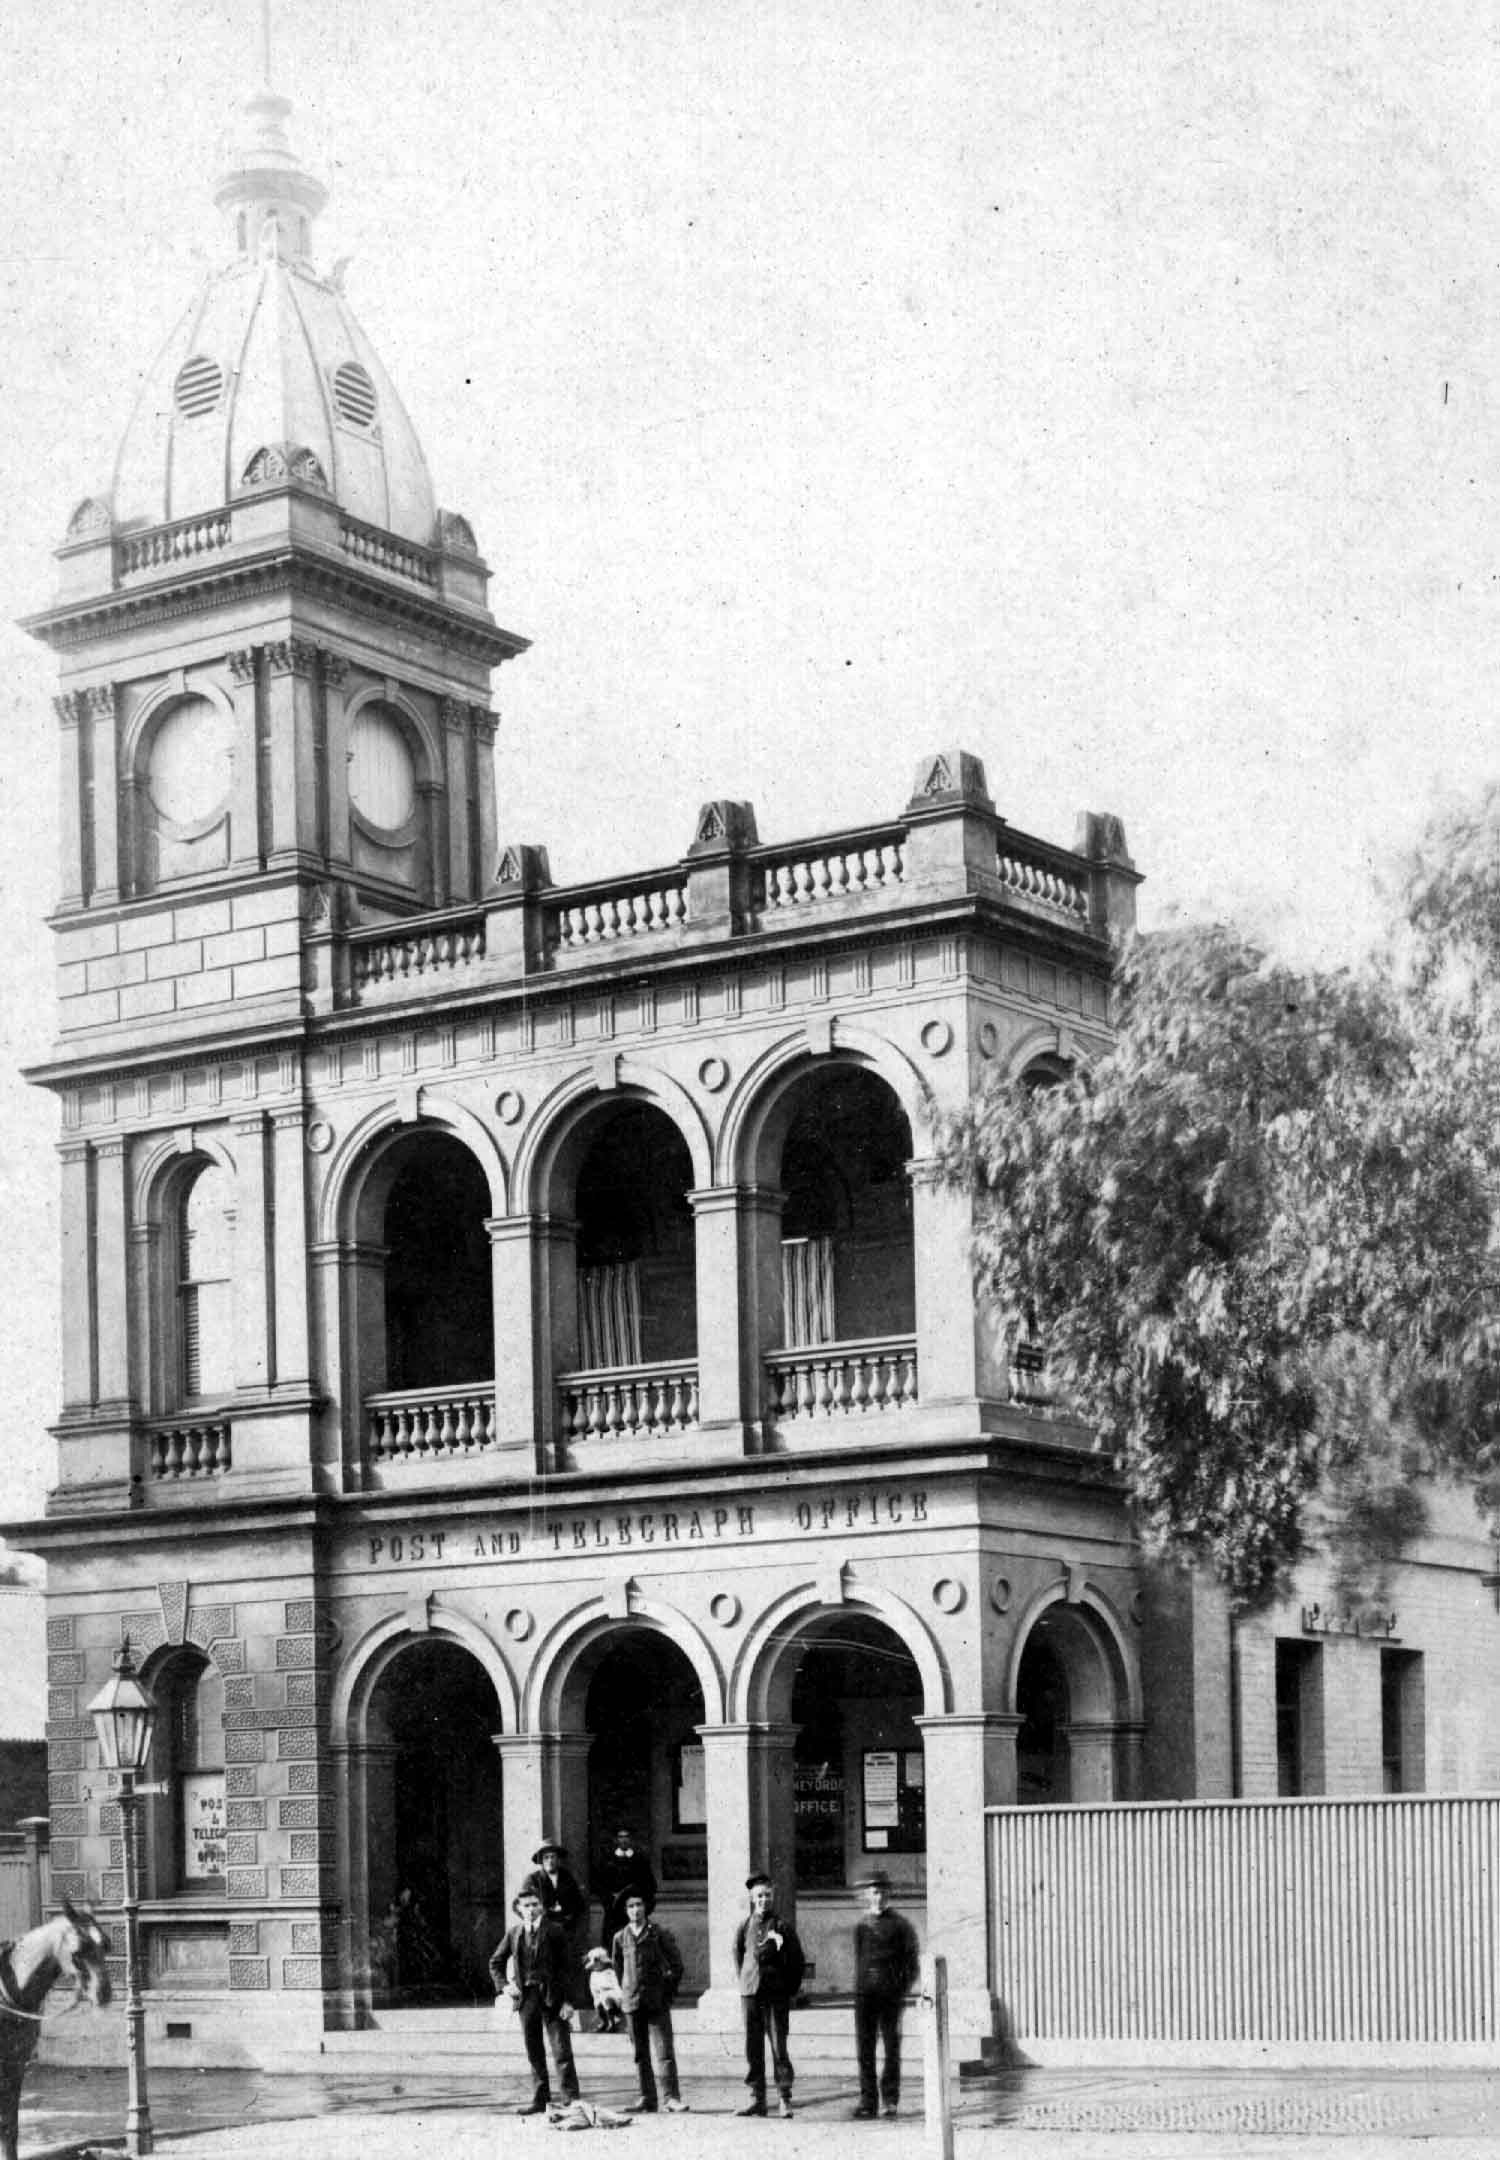 Government and Public – Dunolly Museum, Victoria, Australia